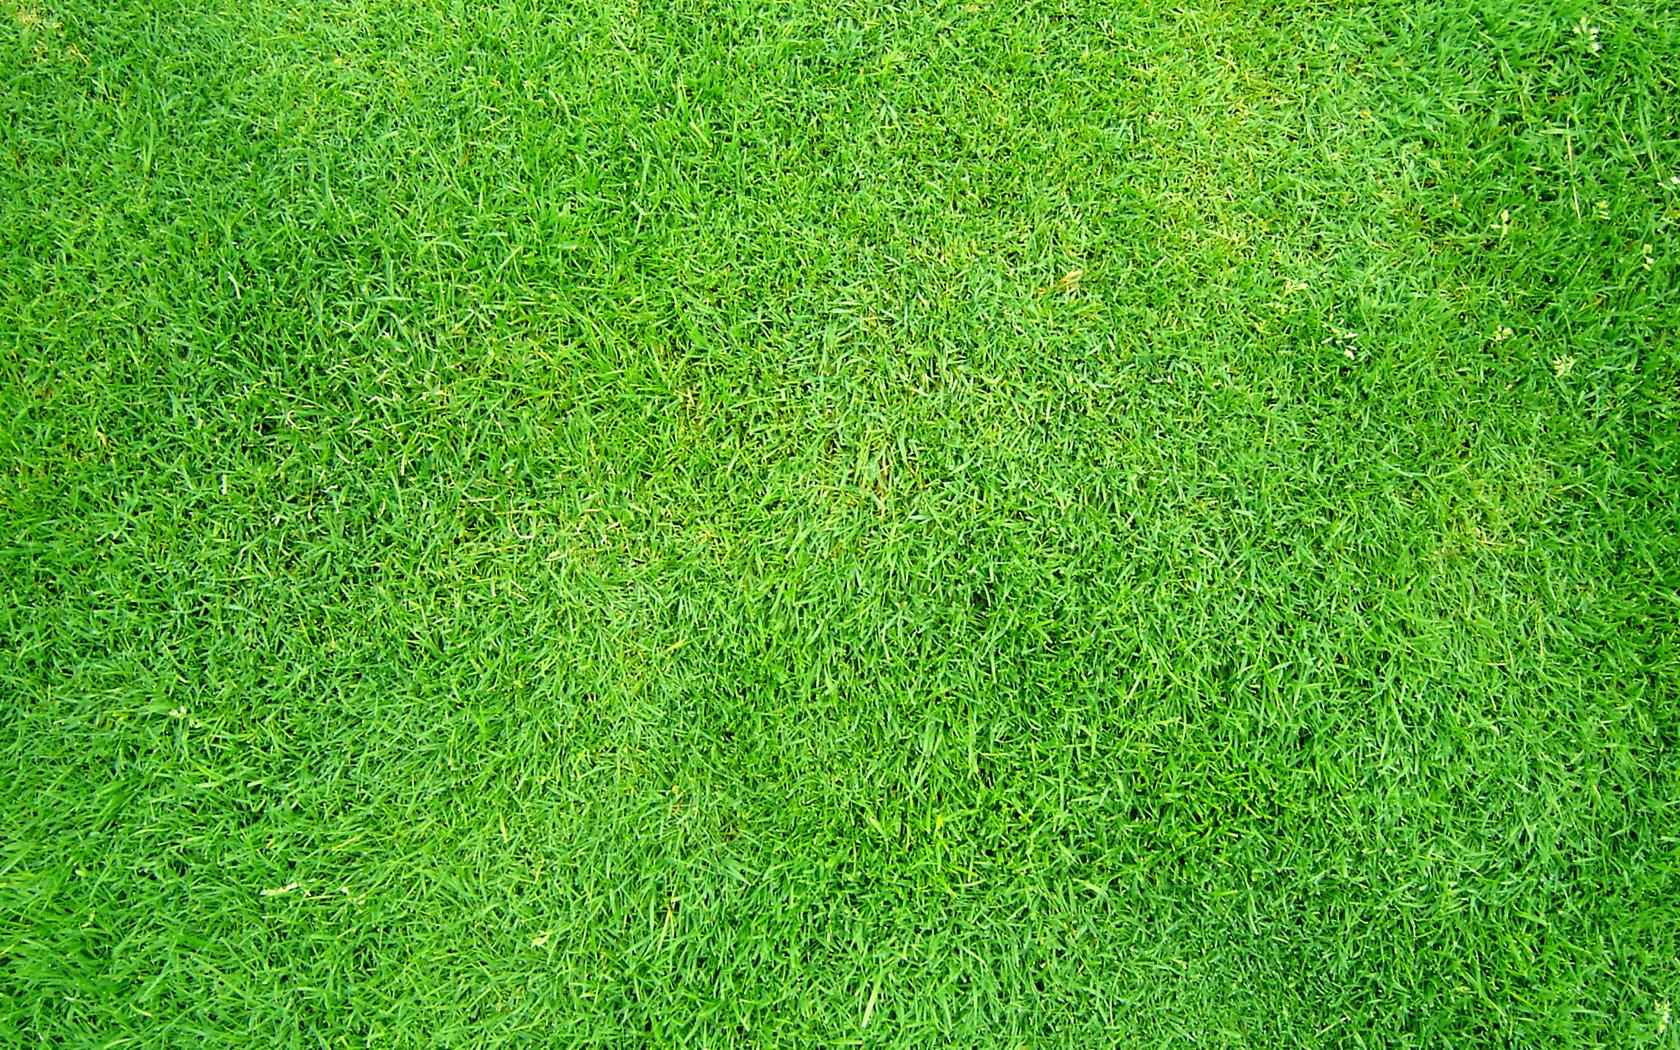 Textured grass photo